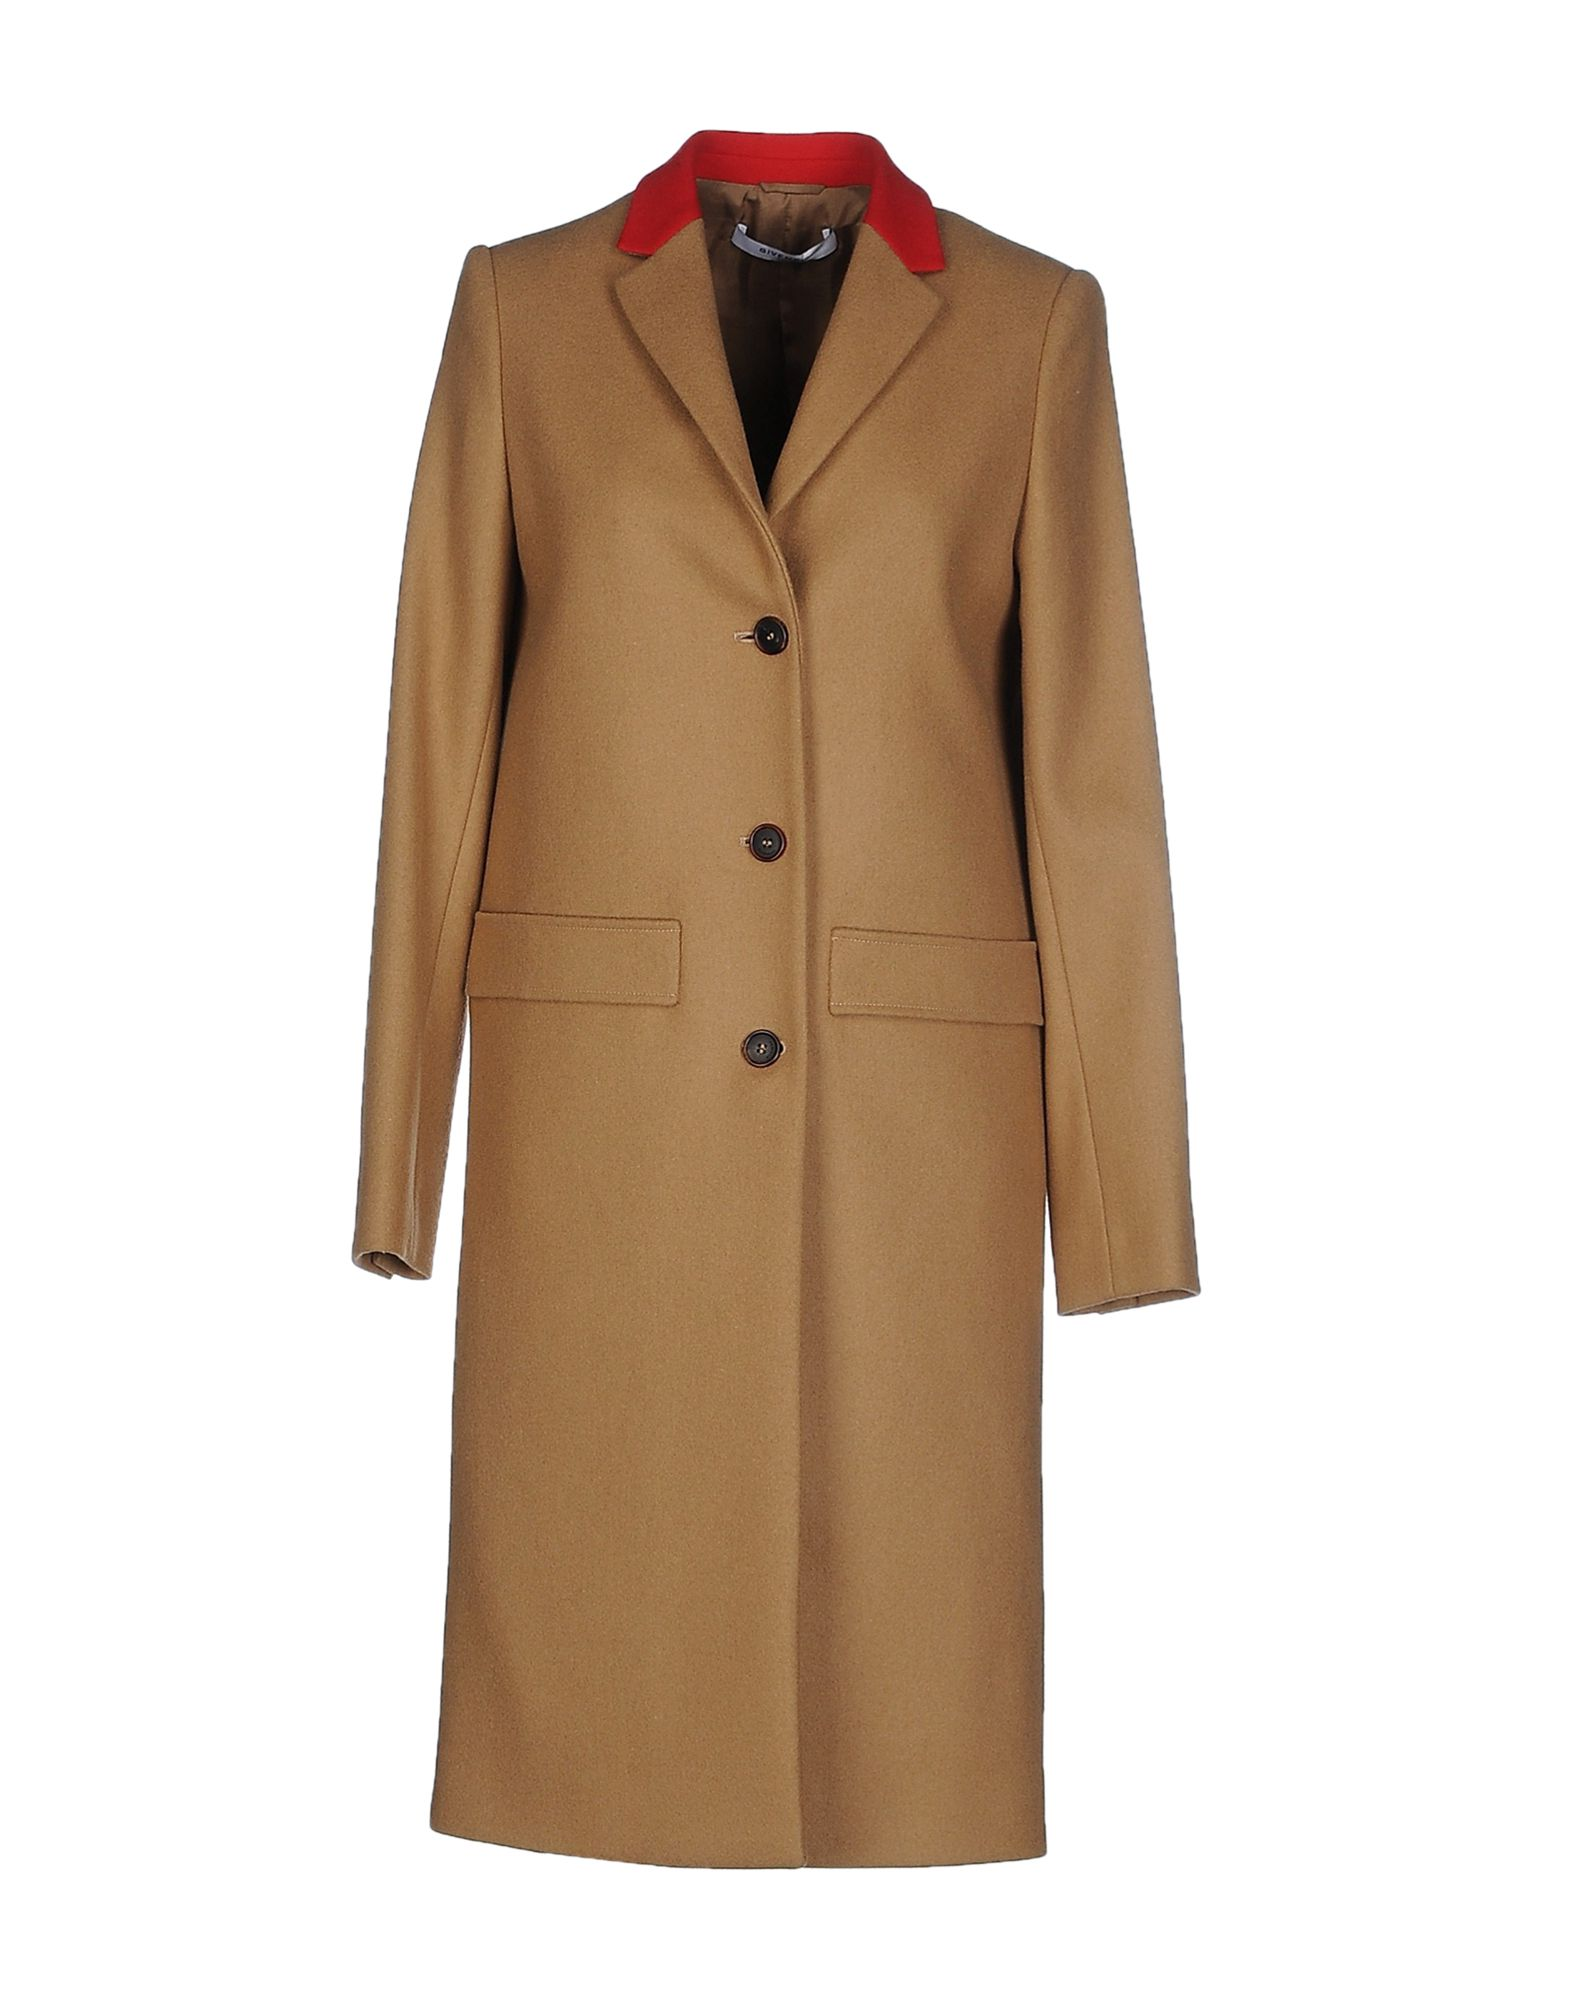 Givenchy Coat - Women Givenchy Coats online on YOOX United ... d96447e85ae92